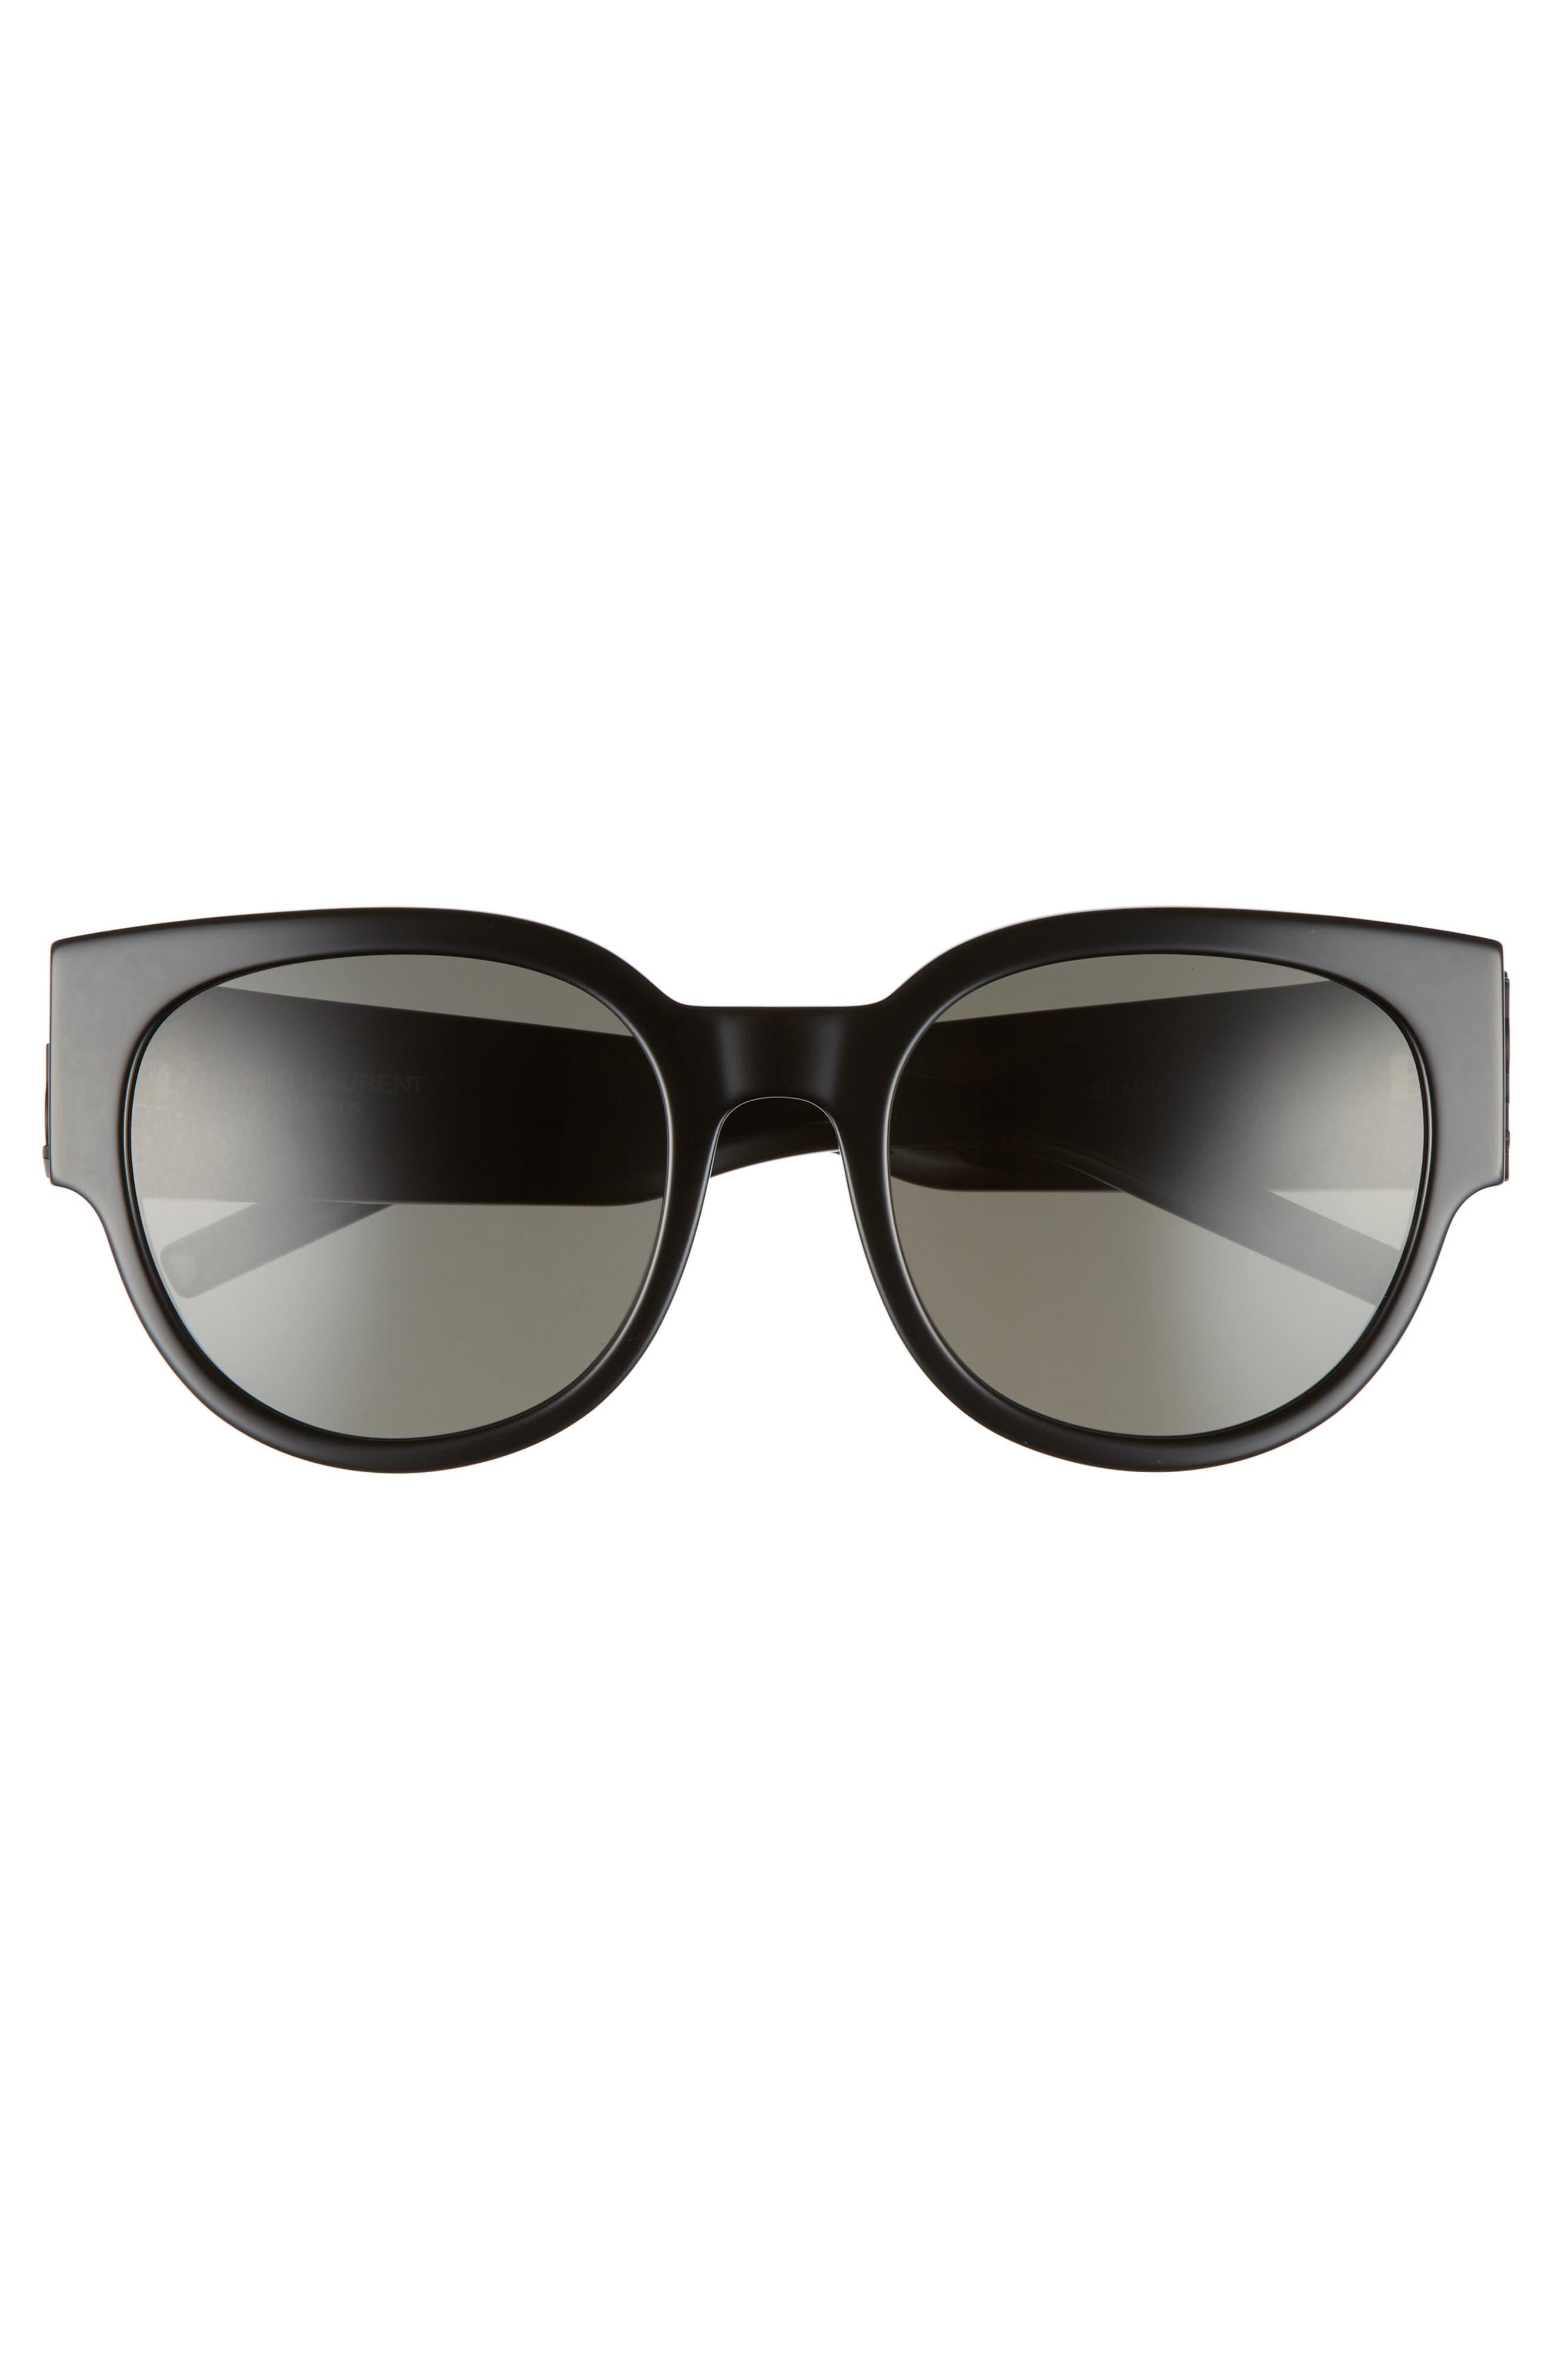 SL M19 54mm Cat Eye Sunglasses,                             Alternate thumbnail 3, color,                             BLACK